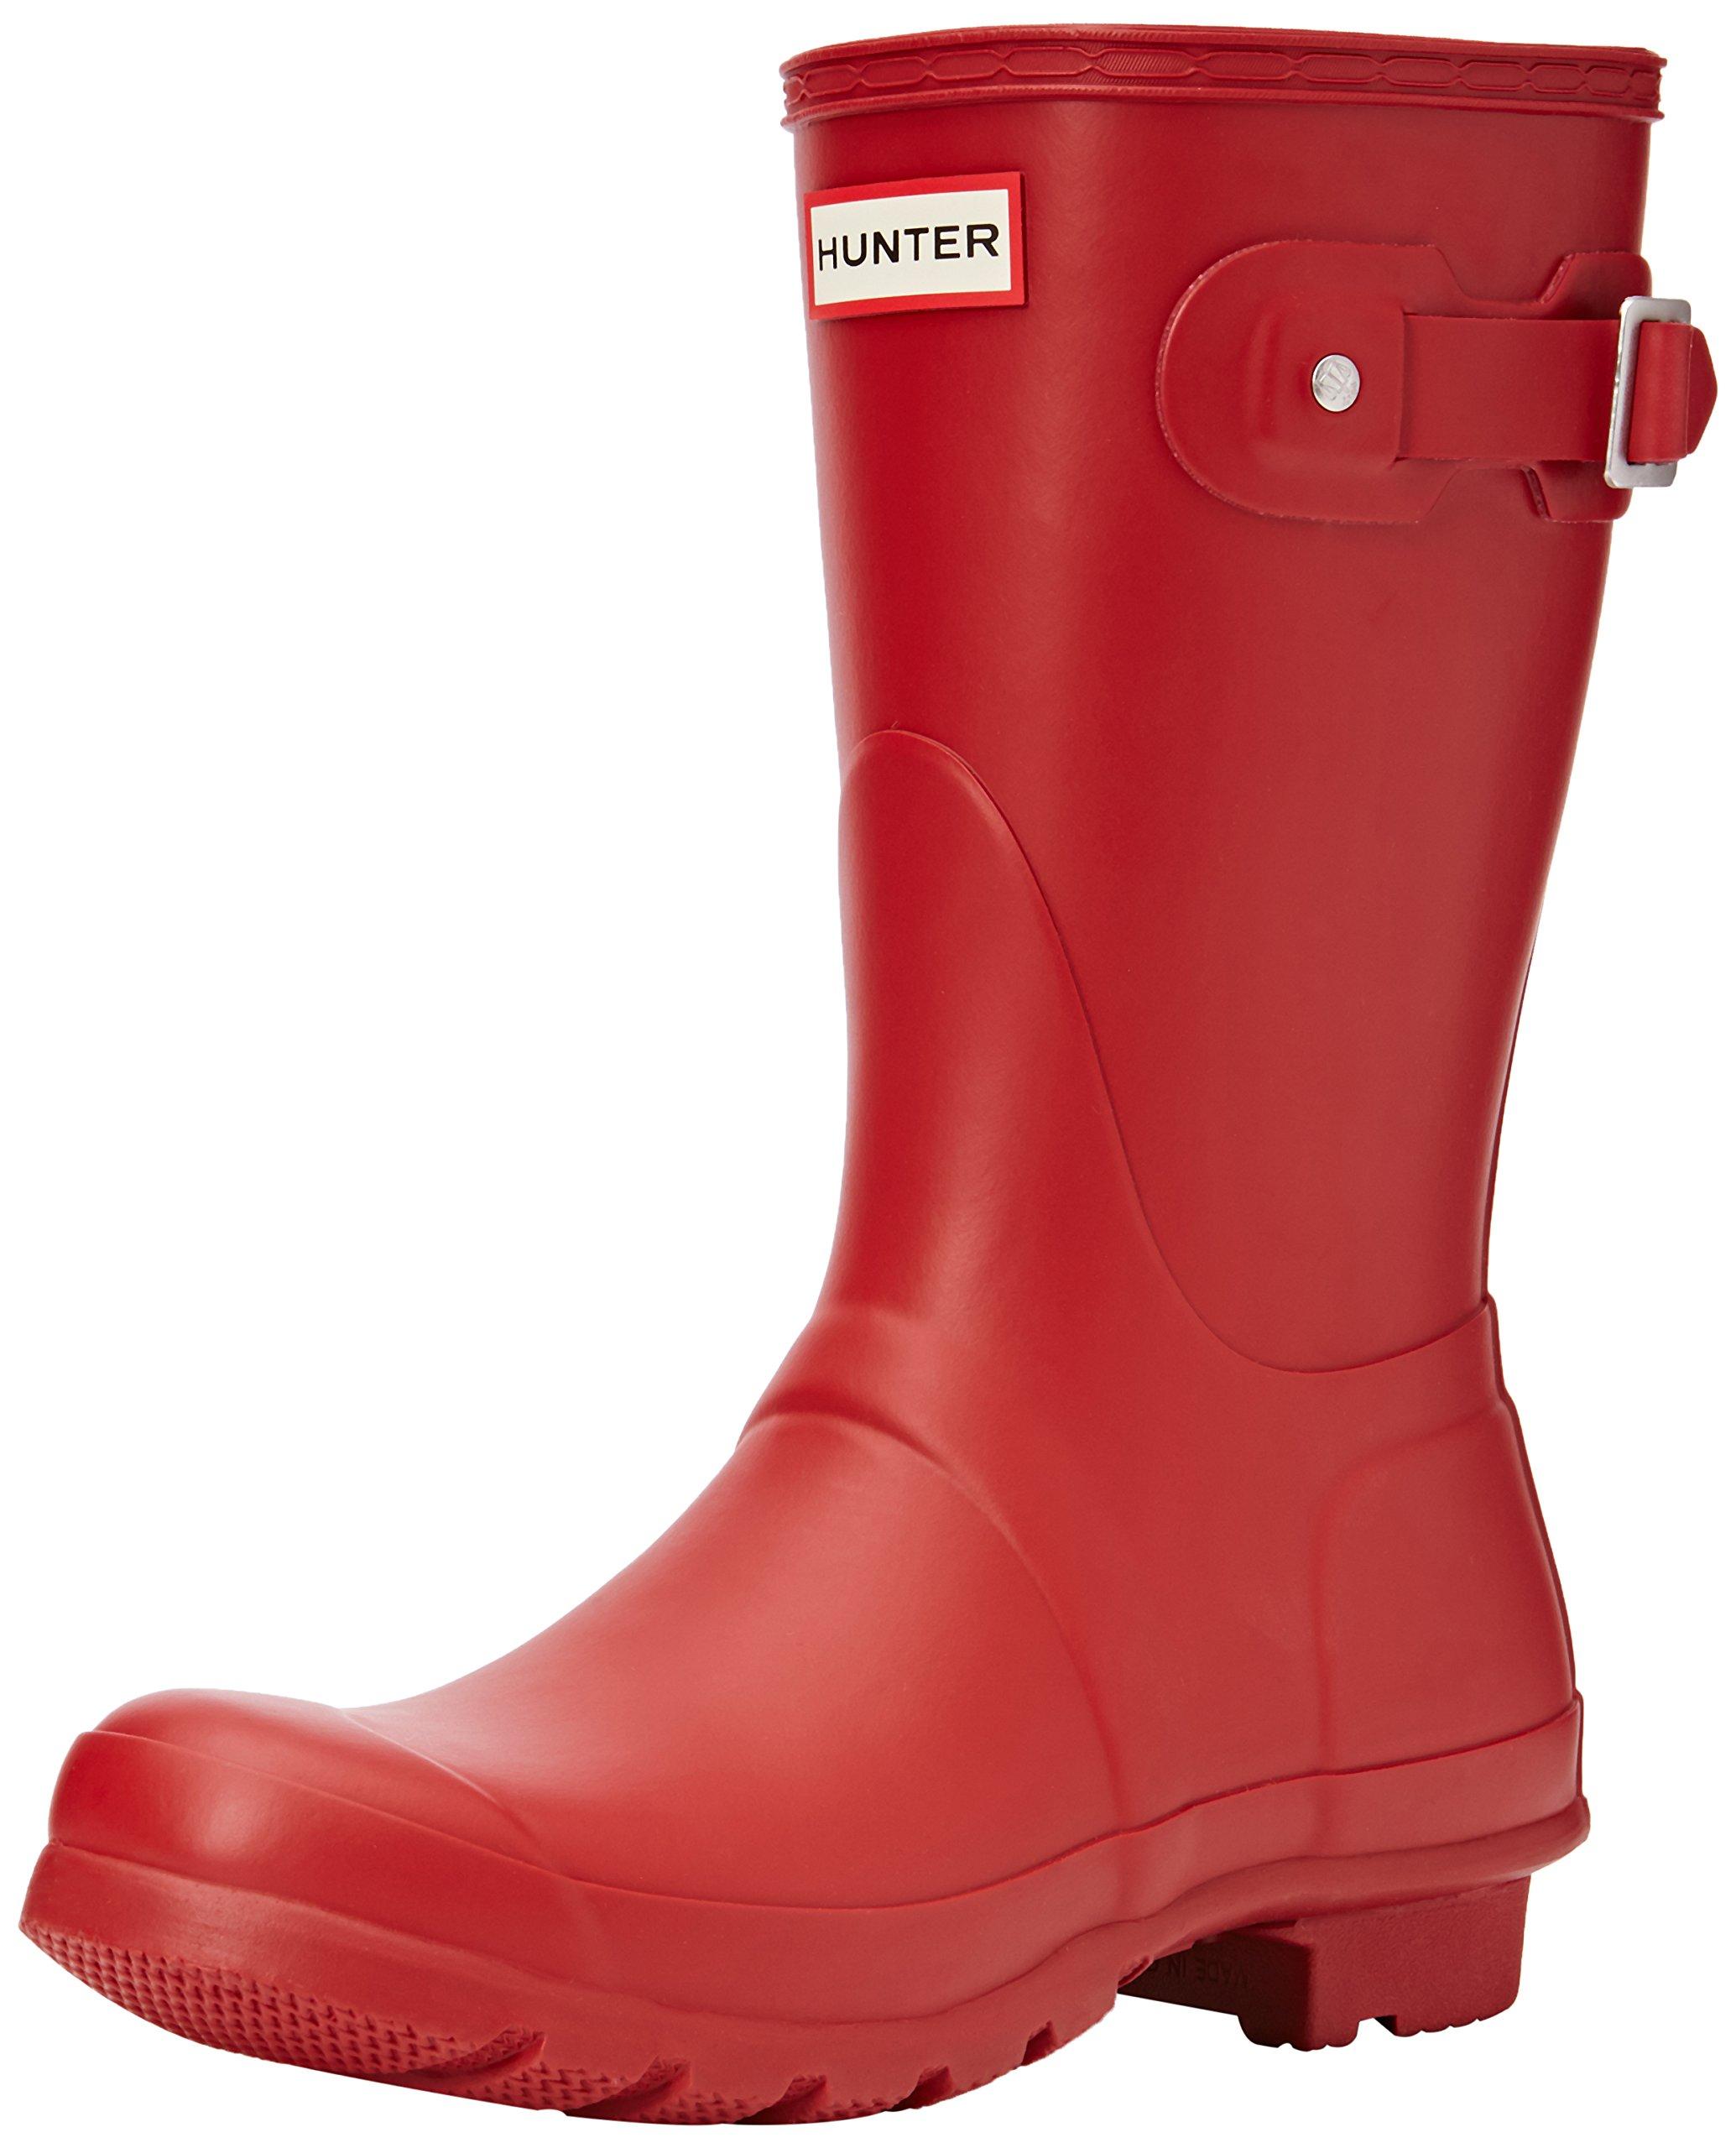 Hunter Womens Original Short Military Red Rain Boot - 8 B(M) US